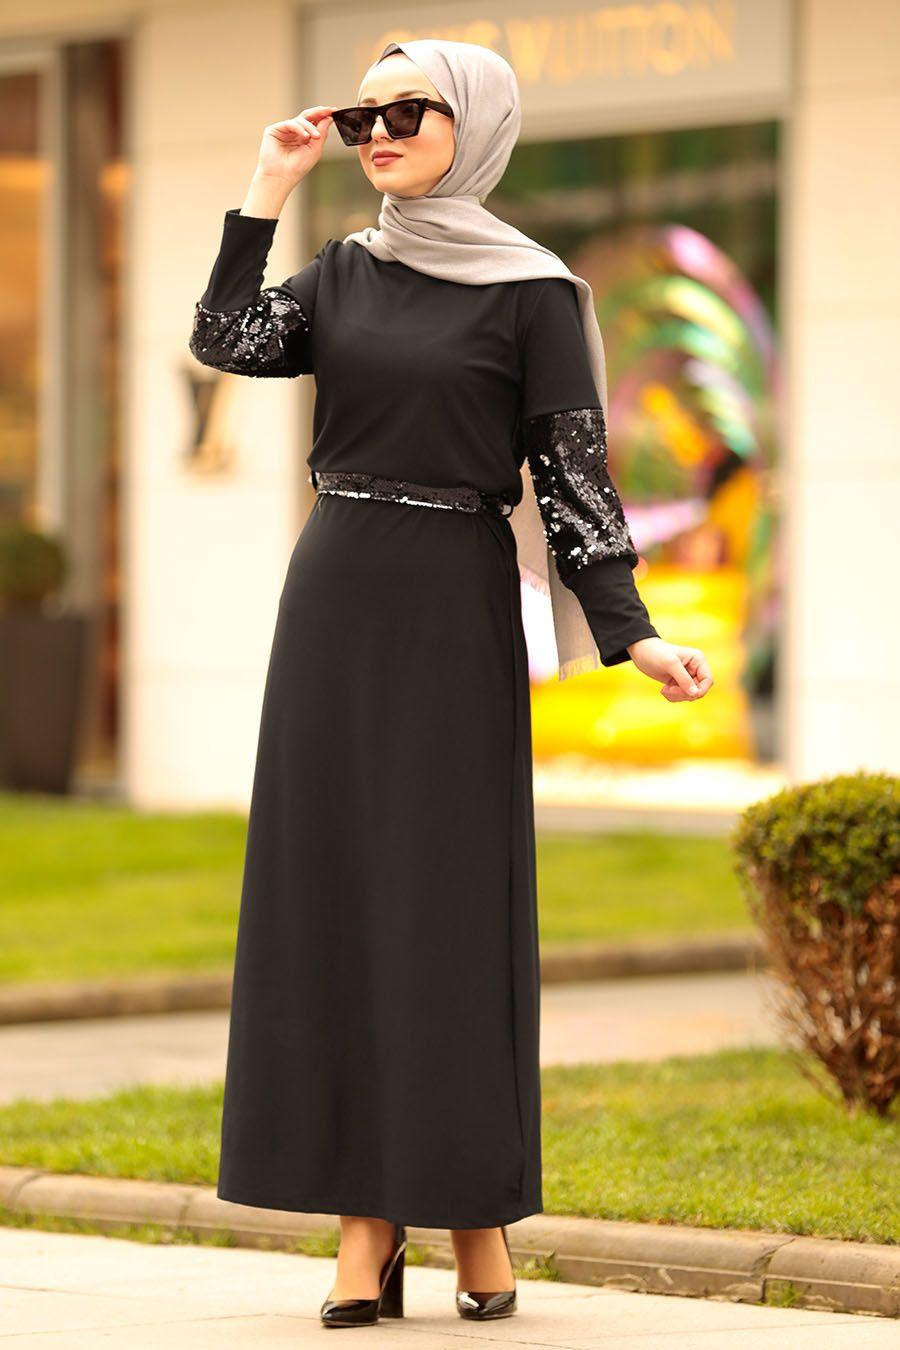 0885d5cf1d218 Nayla Collection - Pul Payetli Siyah Tesettür Elbise 1002S ...